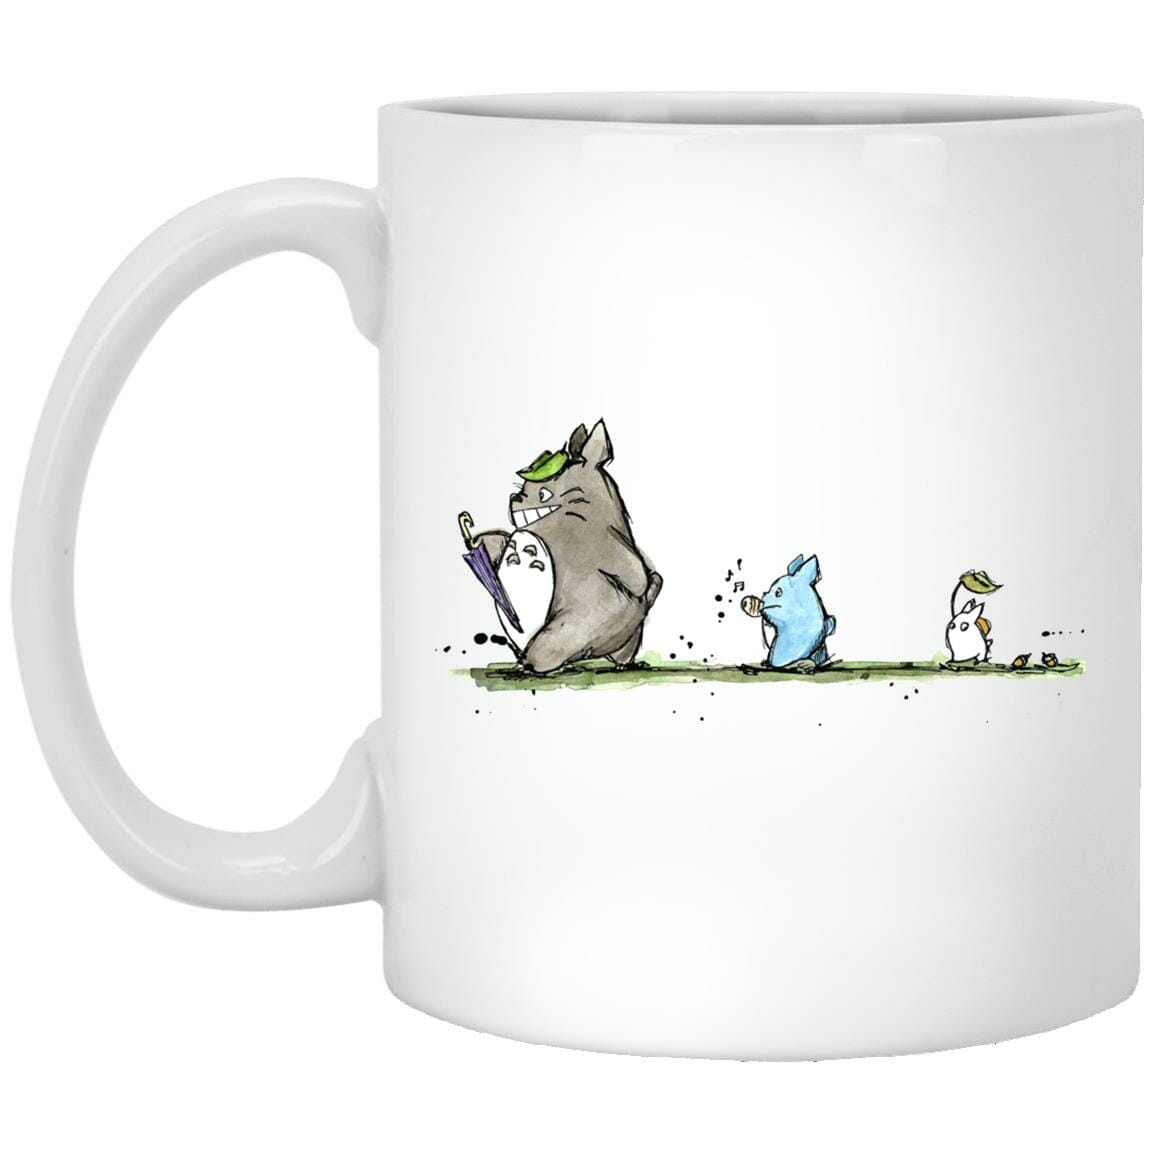 Totoro Family Parade Mug